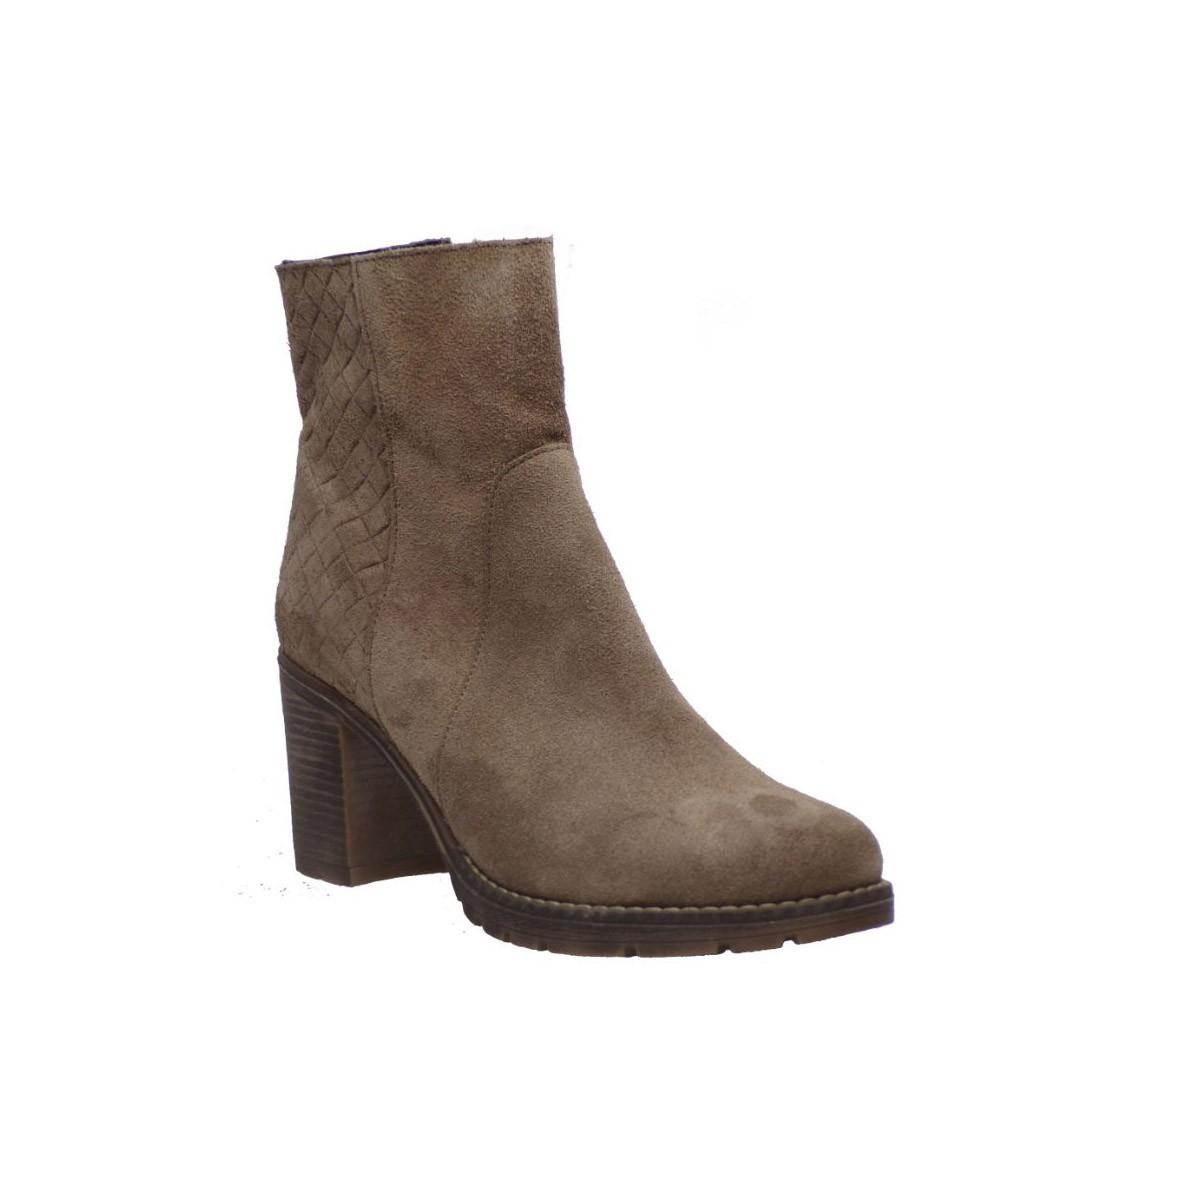 Envie Γυναικεία Παπούτσια Μποτάκια 02-334 Πούρο Envie 02-334 Πούρο